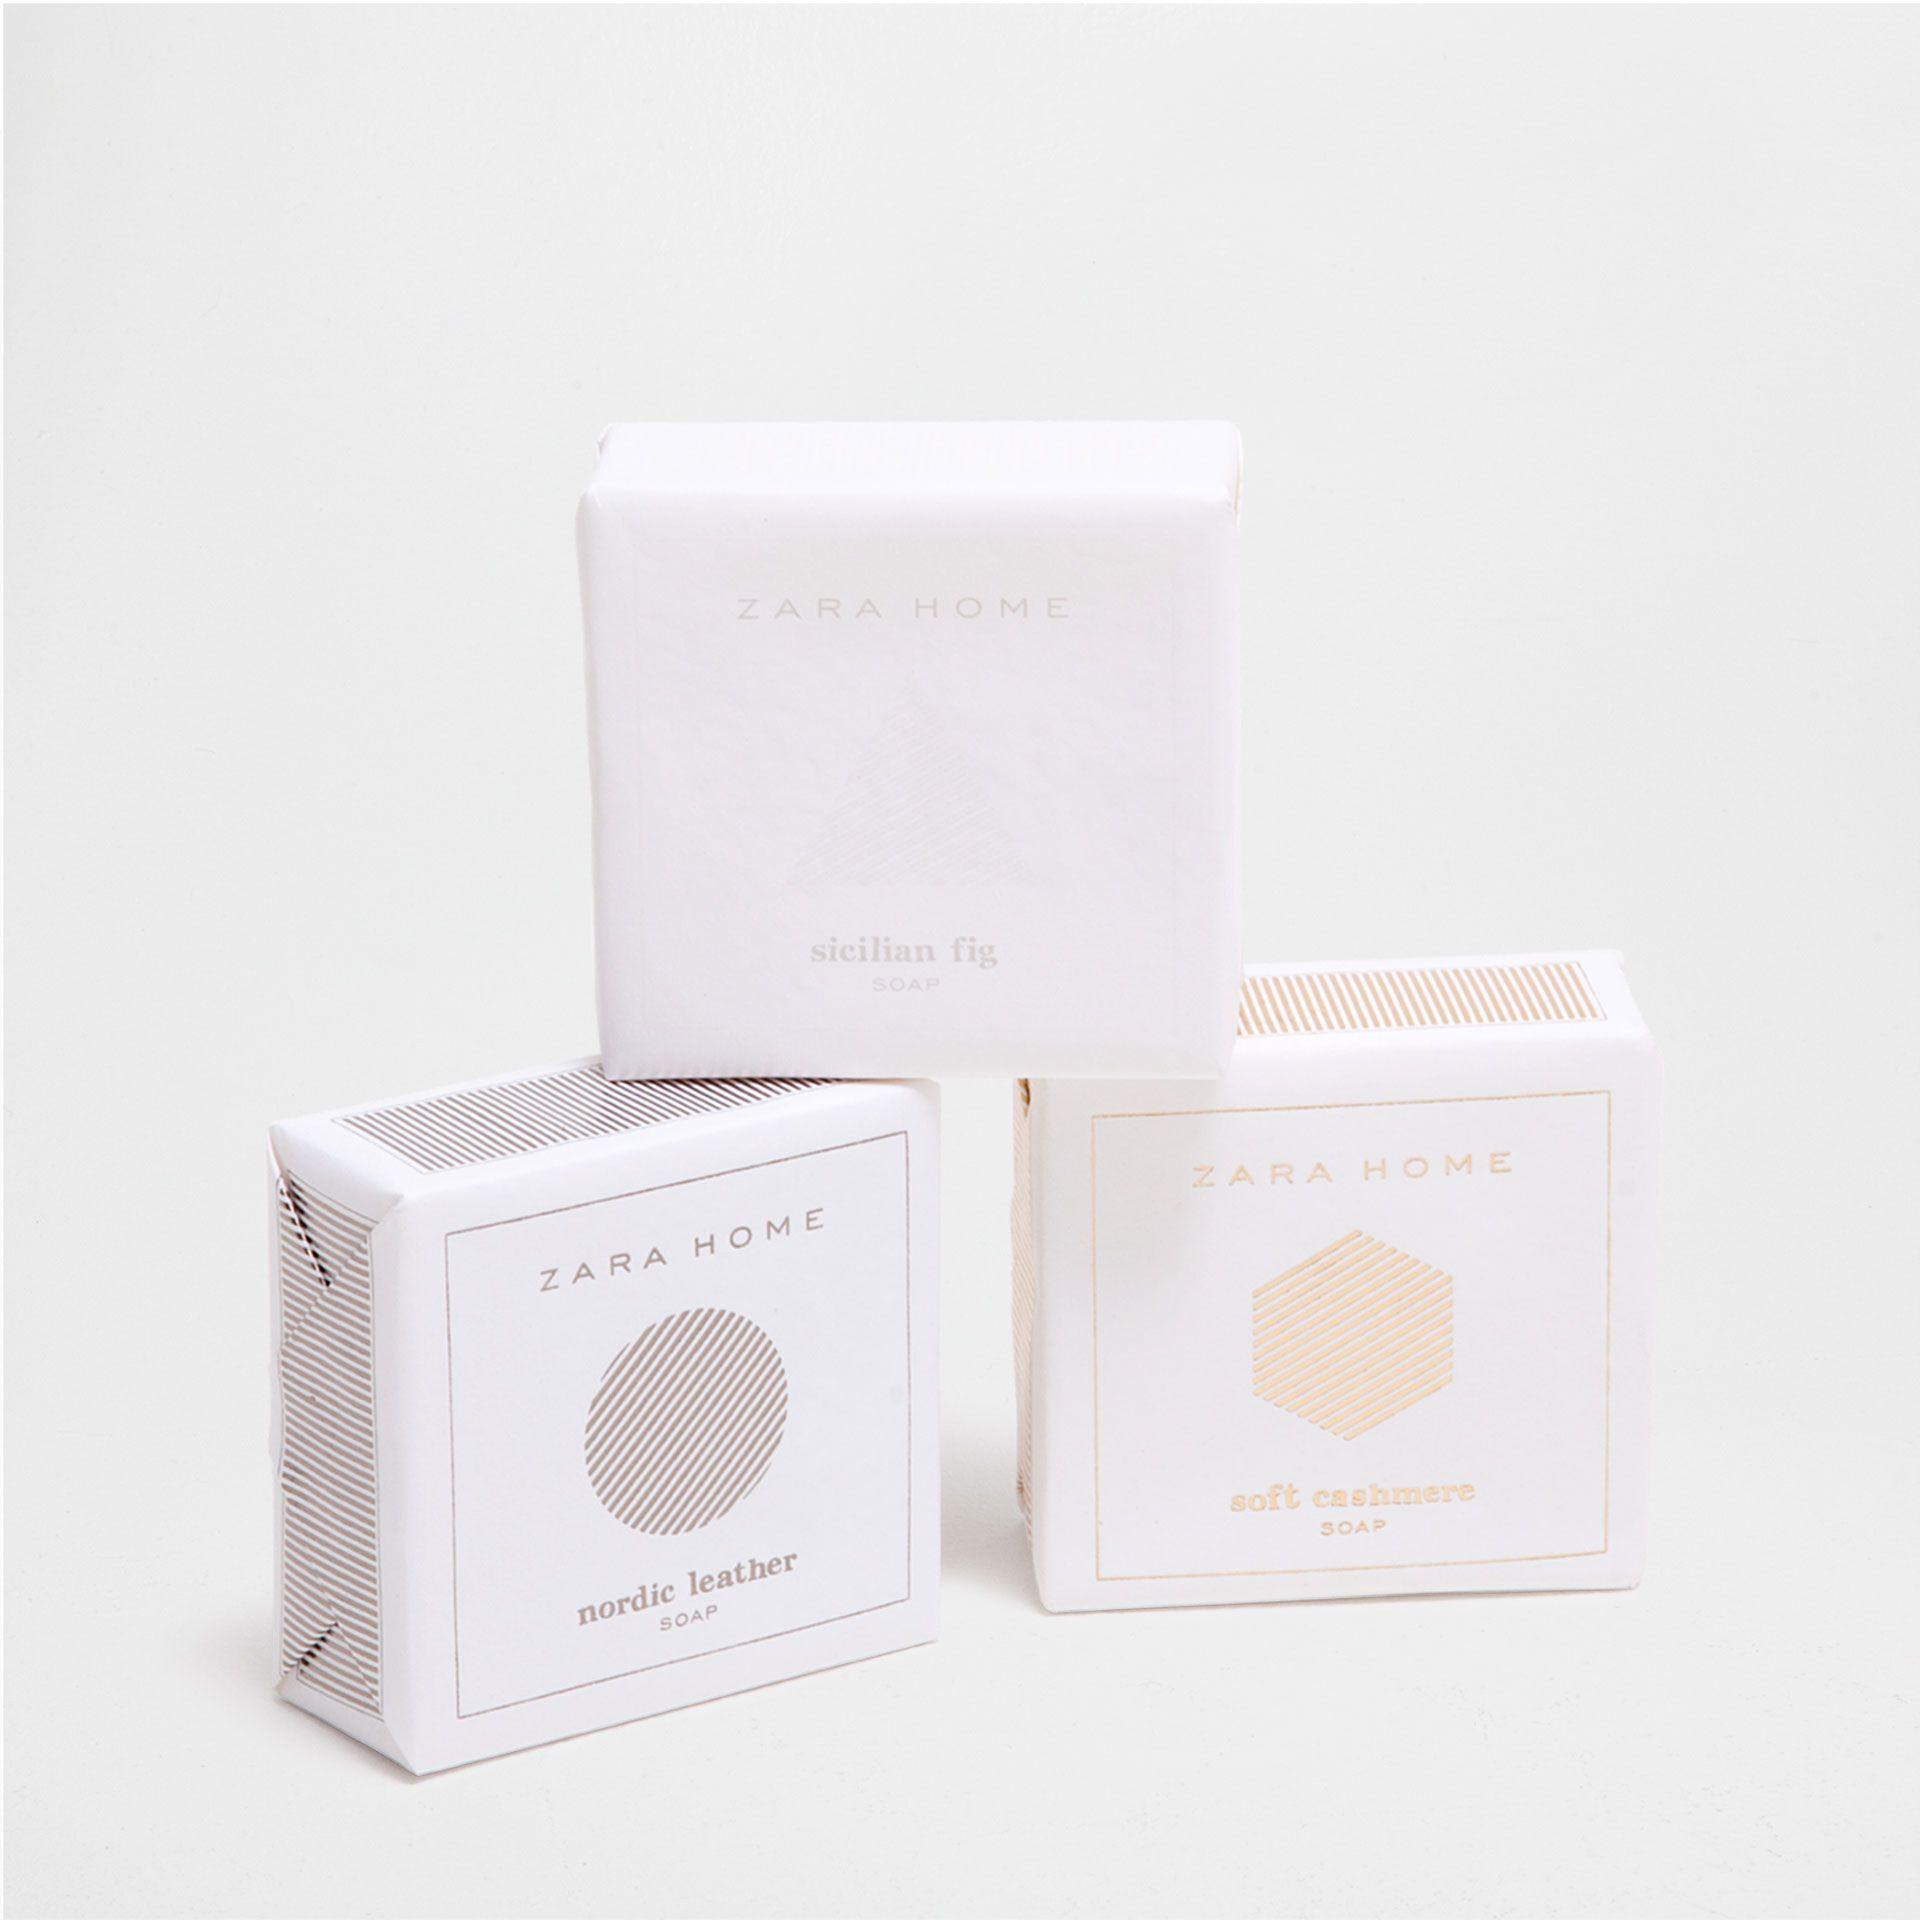 NORDIC LEATHER SOAP BAR - Nordic Leather - Scents - Fragrances | Zara Home United Kingdom